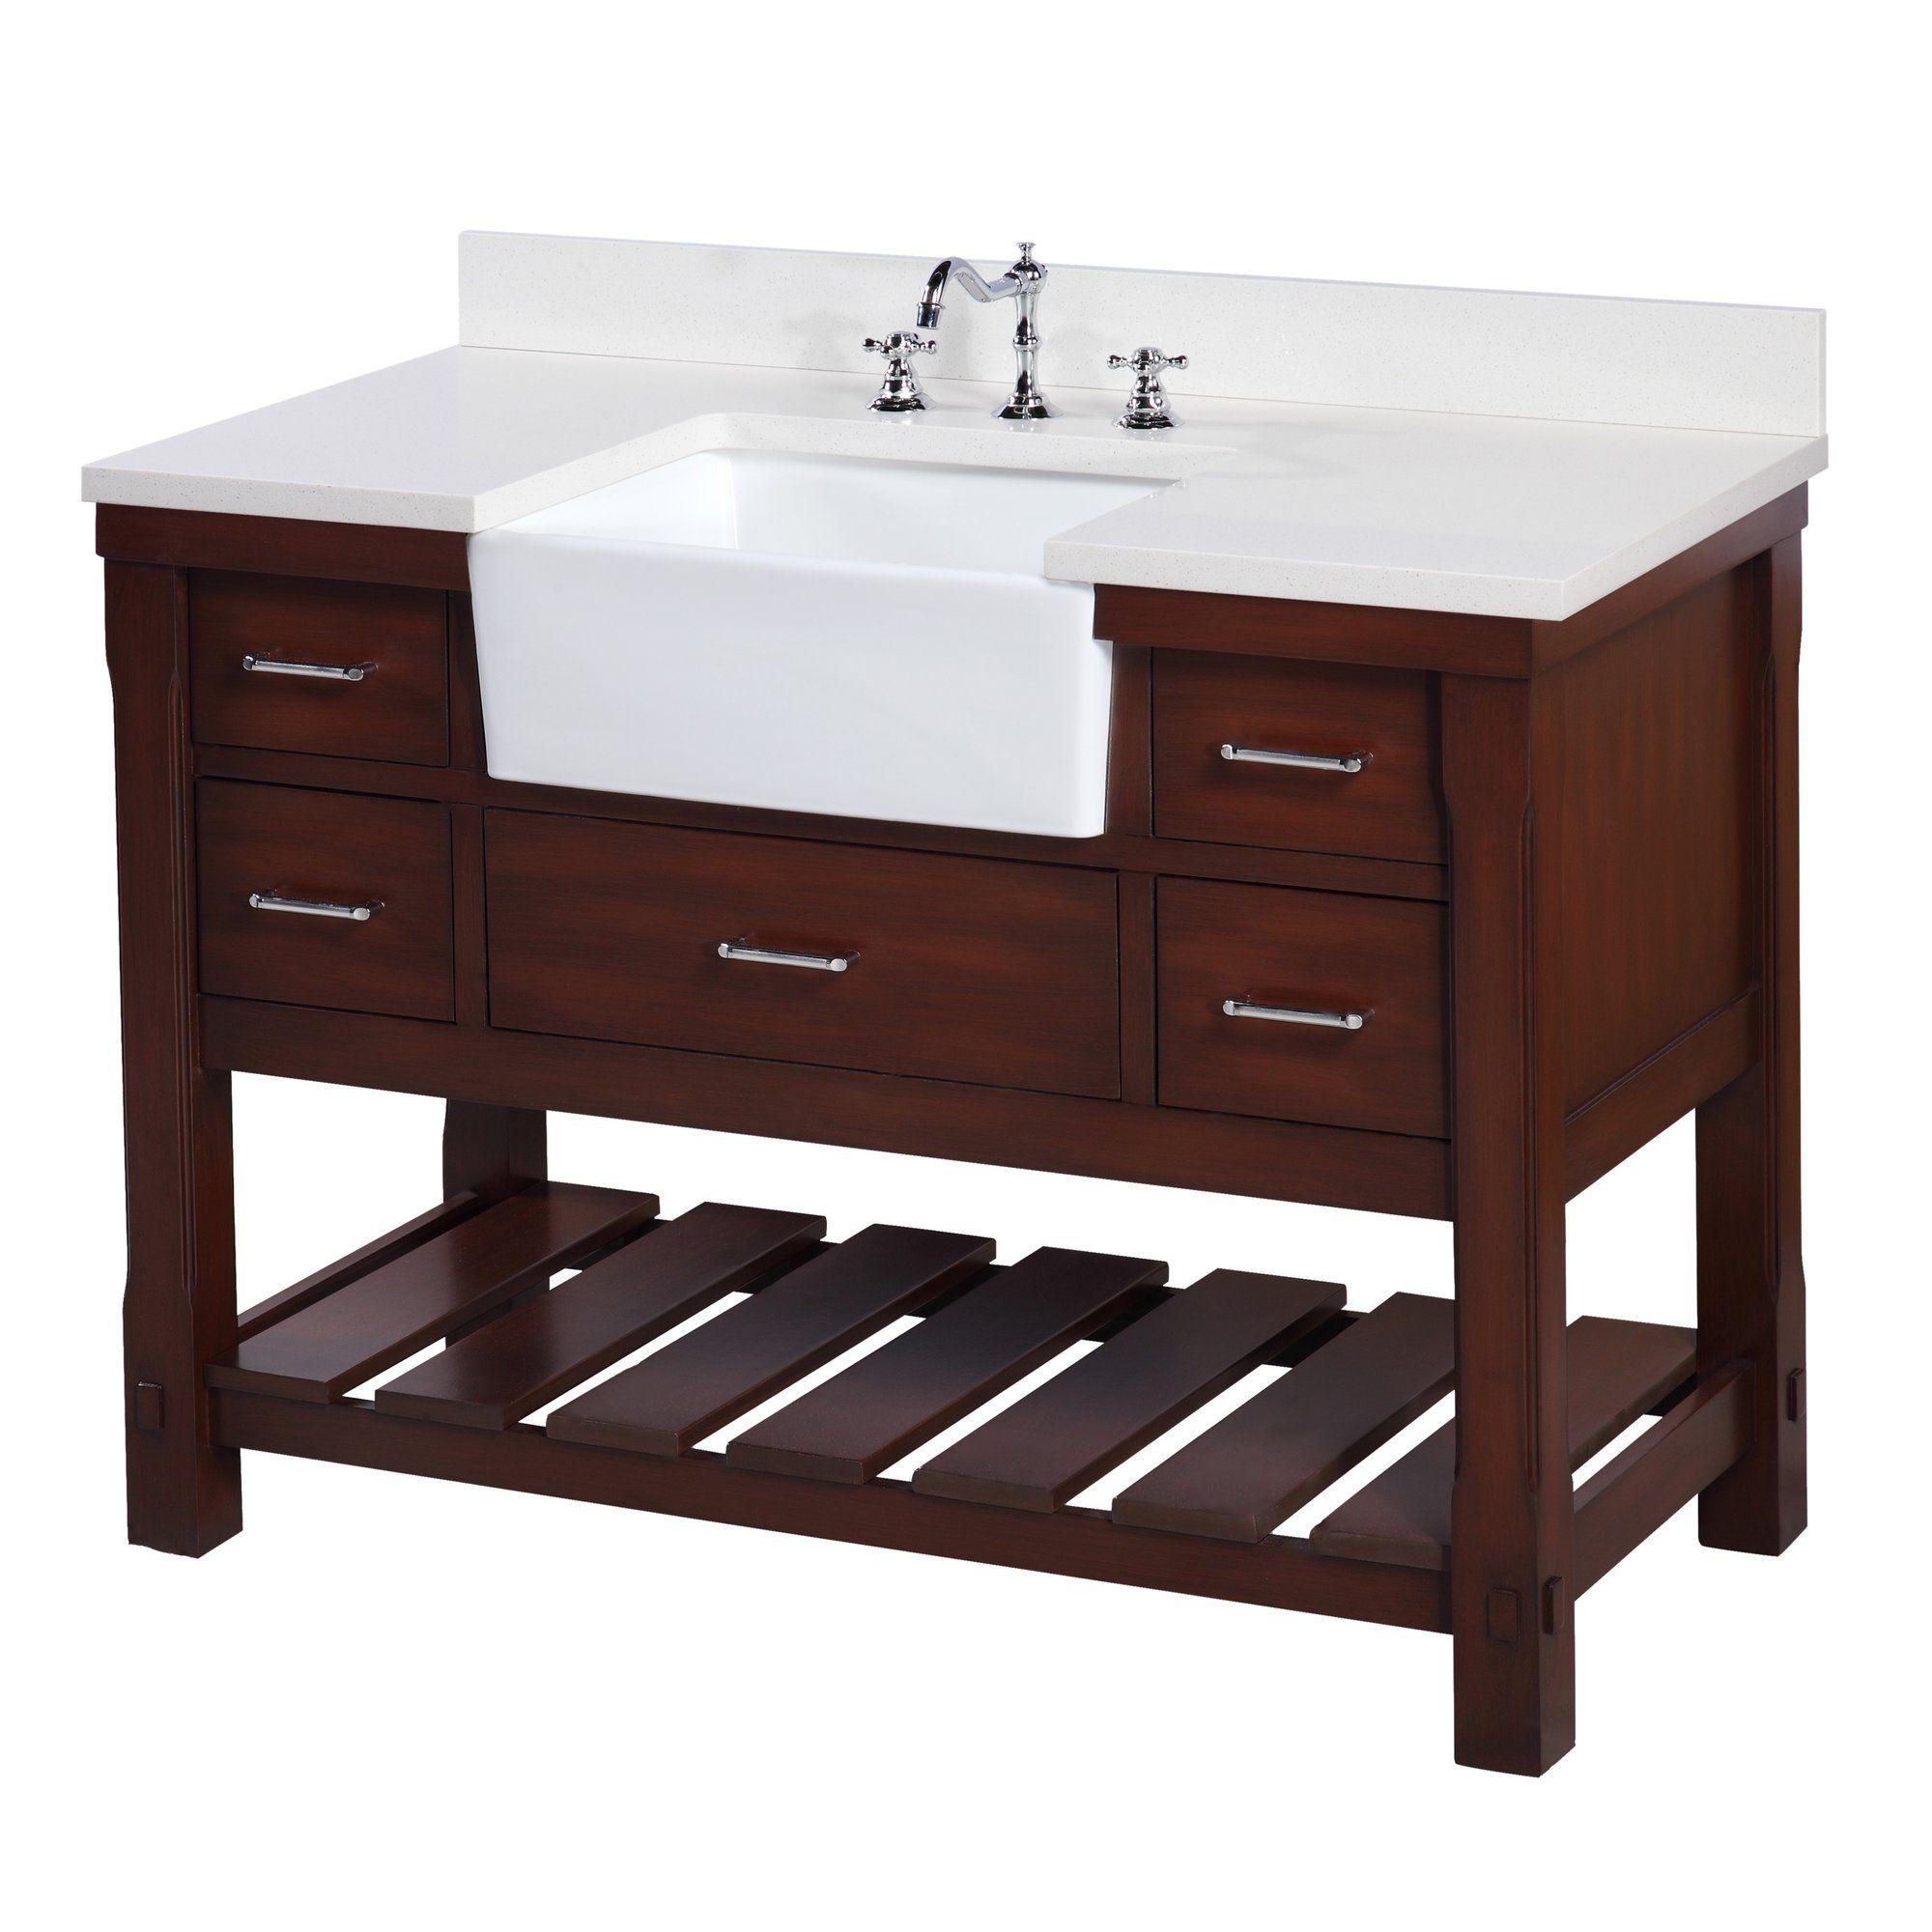 Main Image Zoomed Farmhouse style bathroom vanity